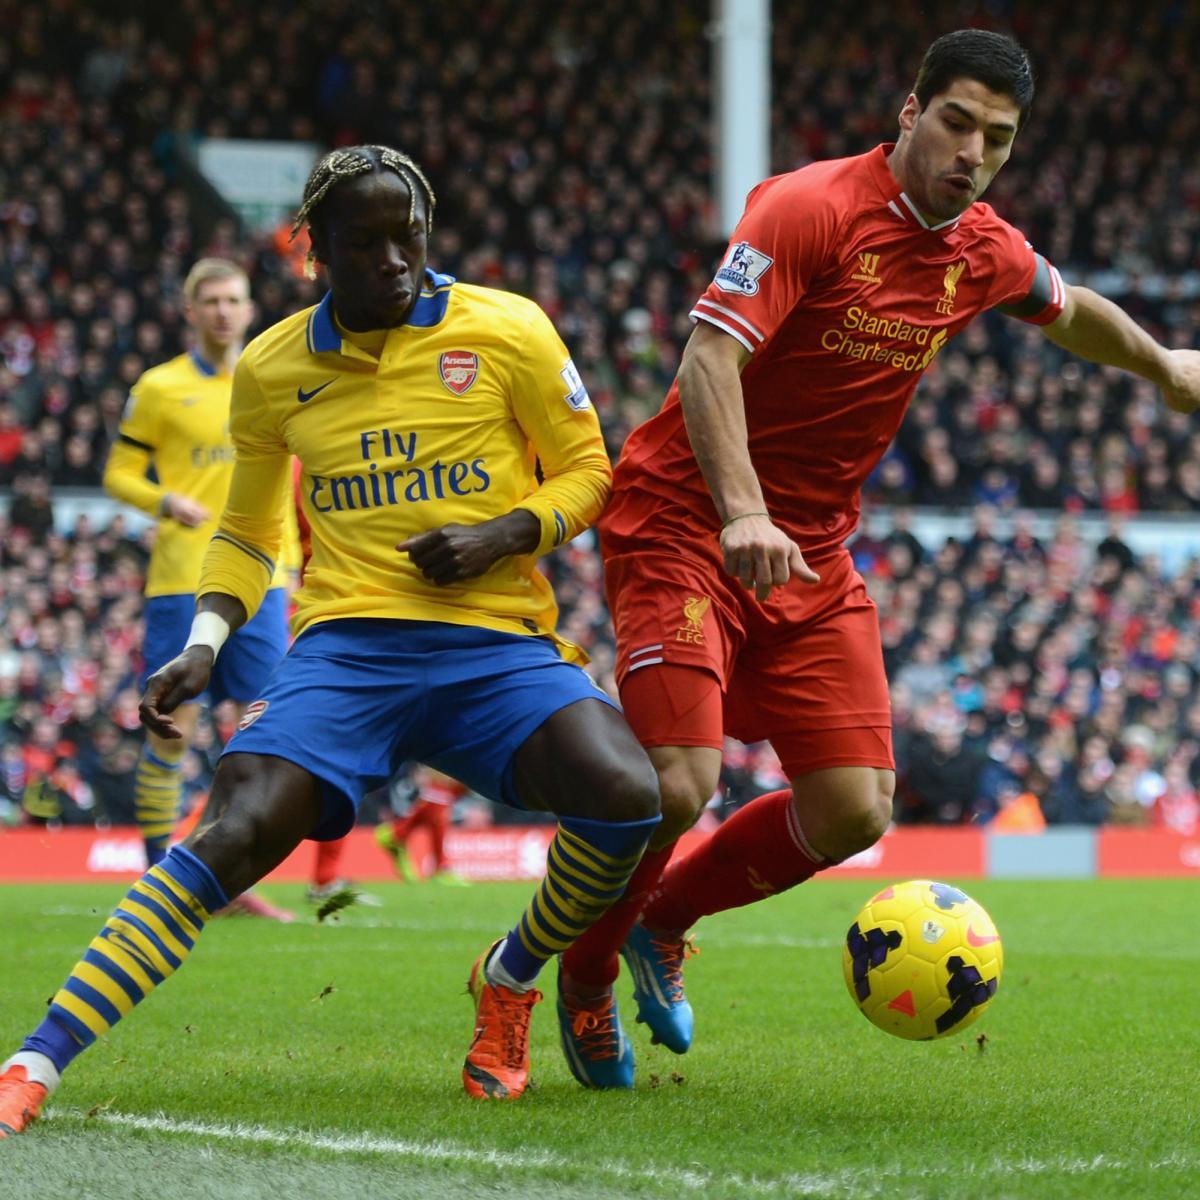 Arsenal Vs Barcelona Live Score Highlights From: Arsenal Vs. Liverpool: FA Cup Live Score, Highlights